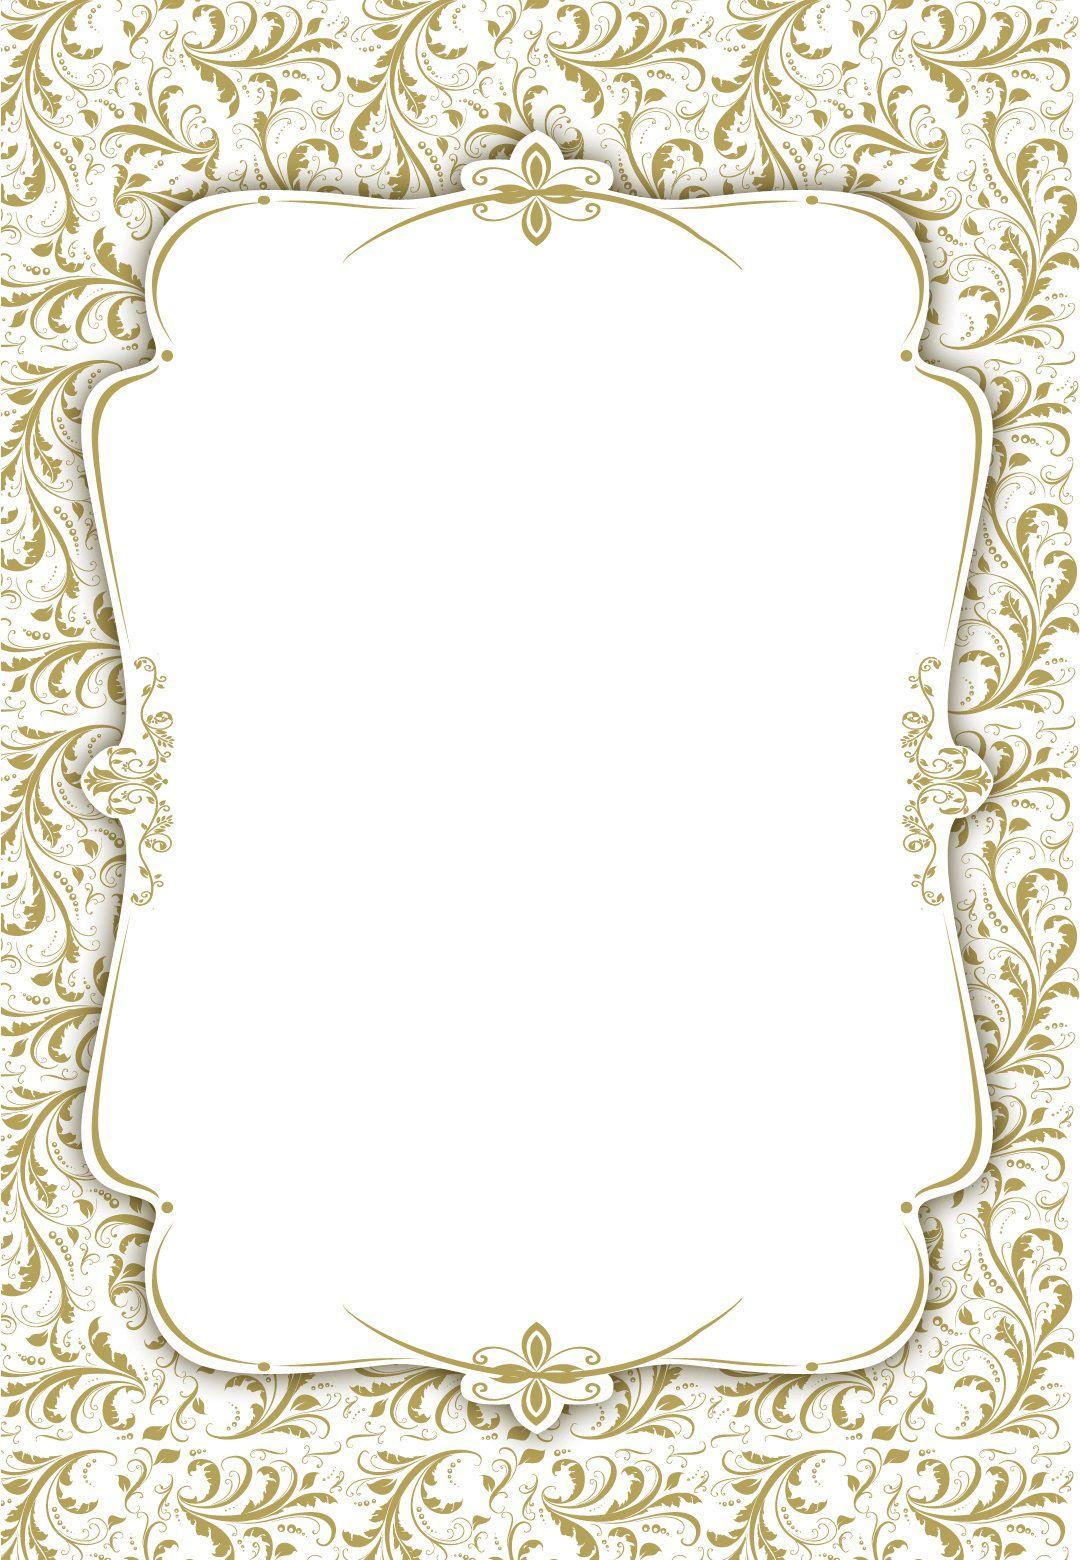 003 Stunning Blank Wedding Invitation Template Idea  Templates Free Download Printable Royal BlueFull